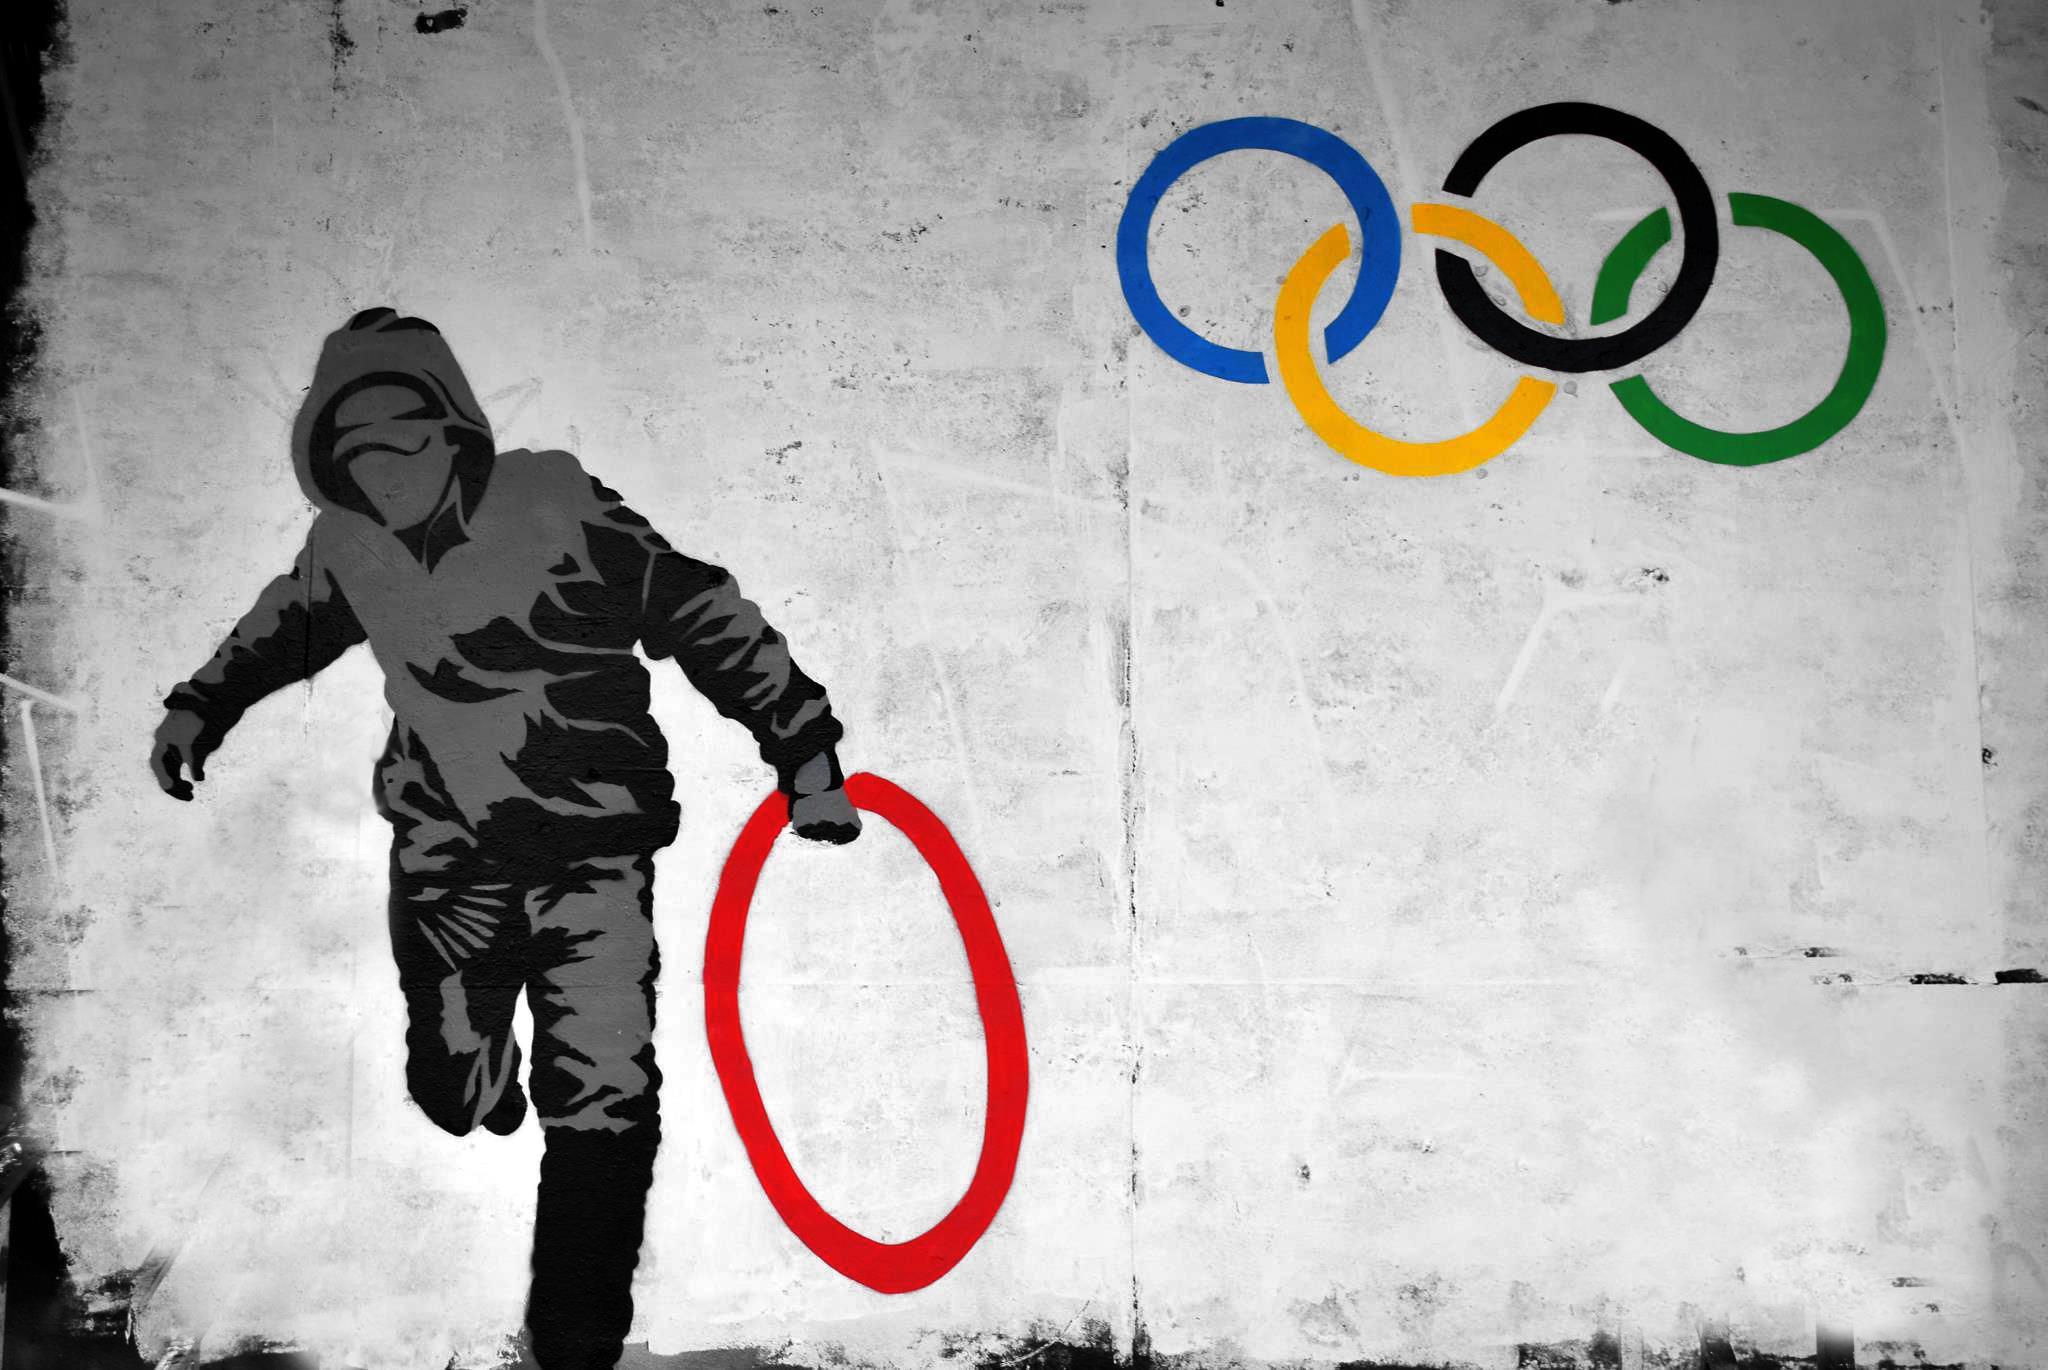 Olympics©CriminalChalkist